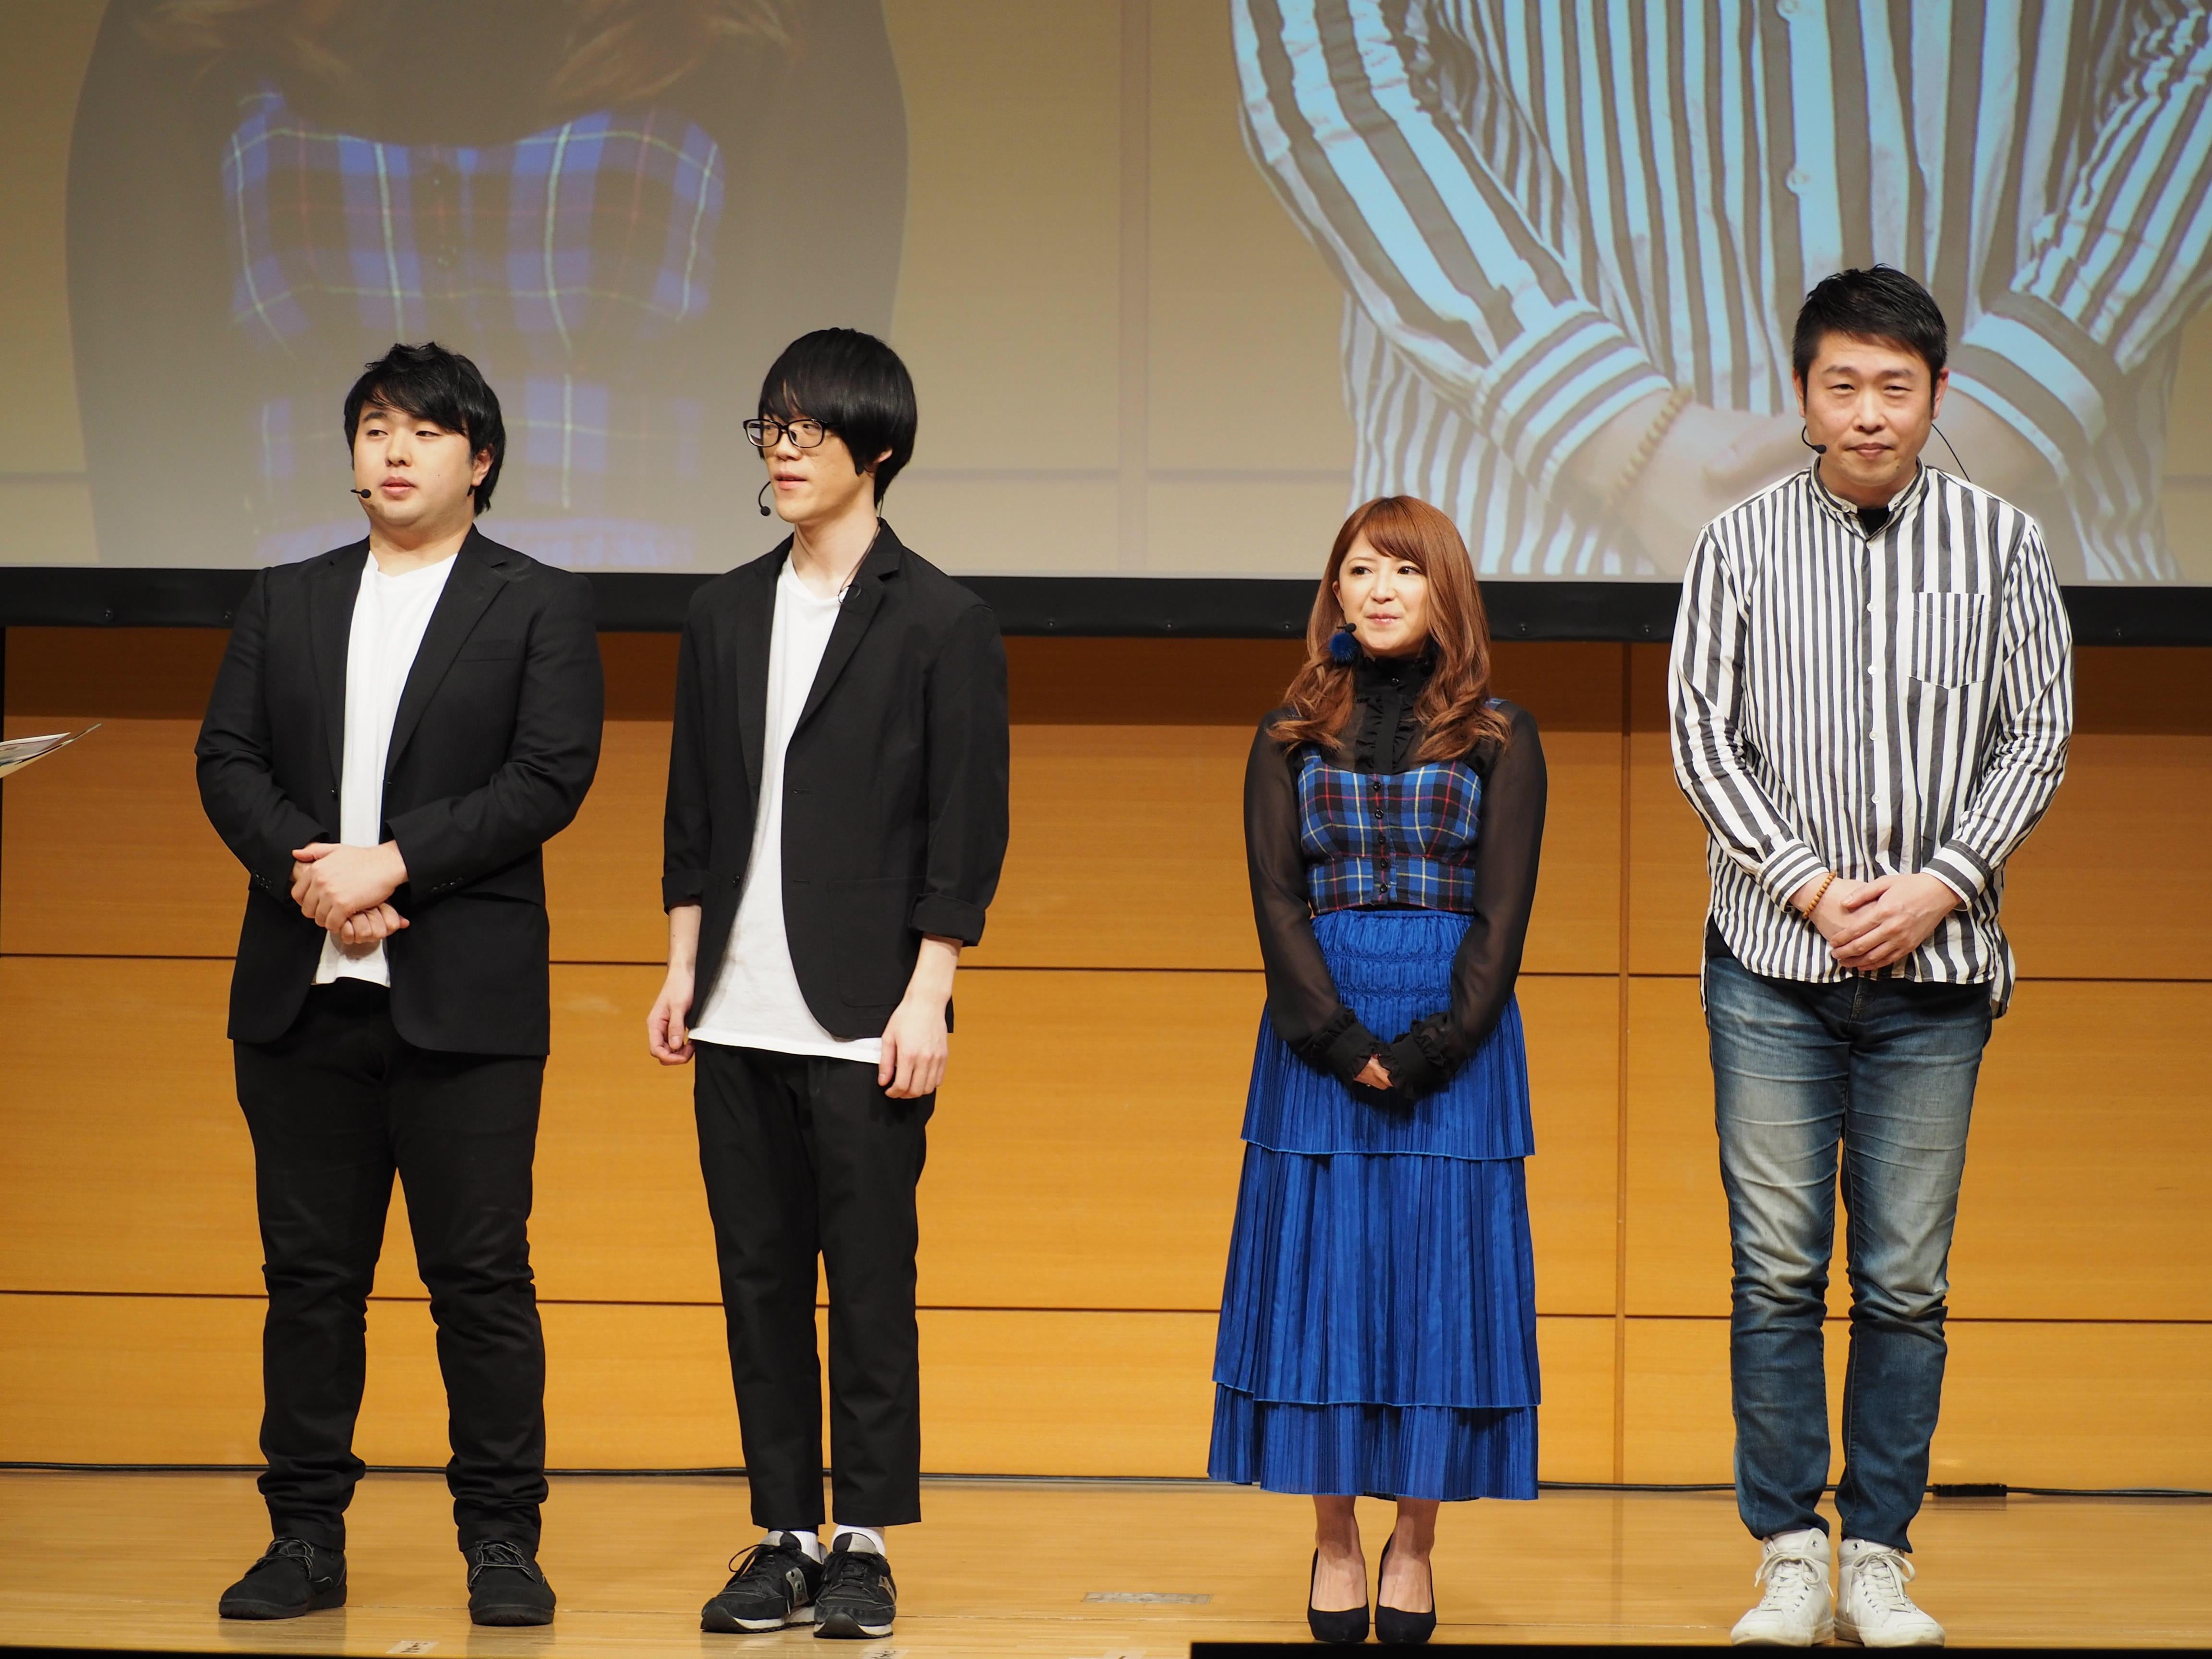 http://news.yoshimoto.co.jp/20180131215846-1db2eec7954ba3ac4a30c7cba174be5f783c0dea.jpg